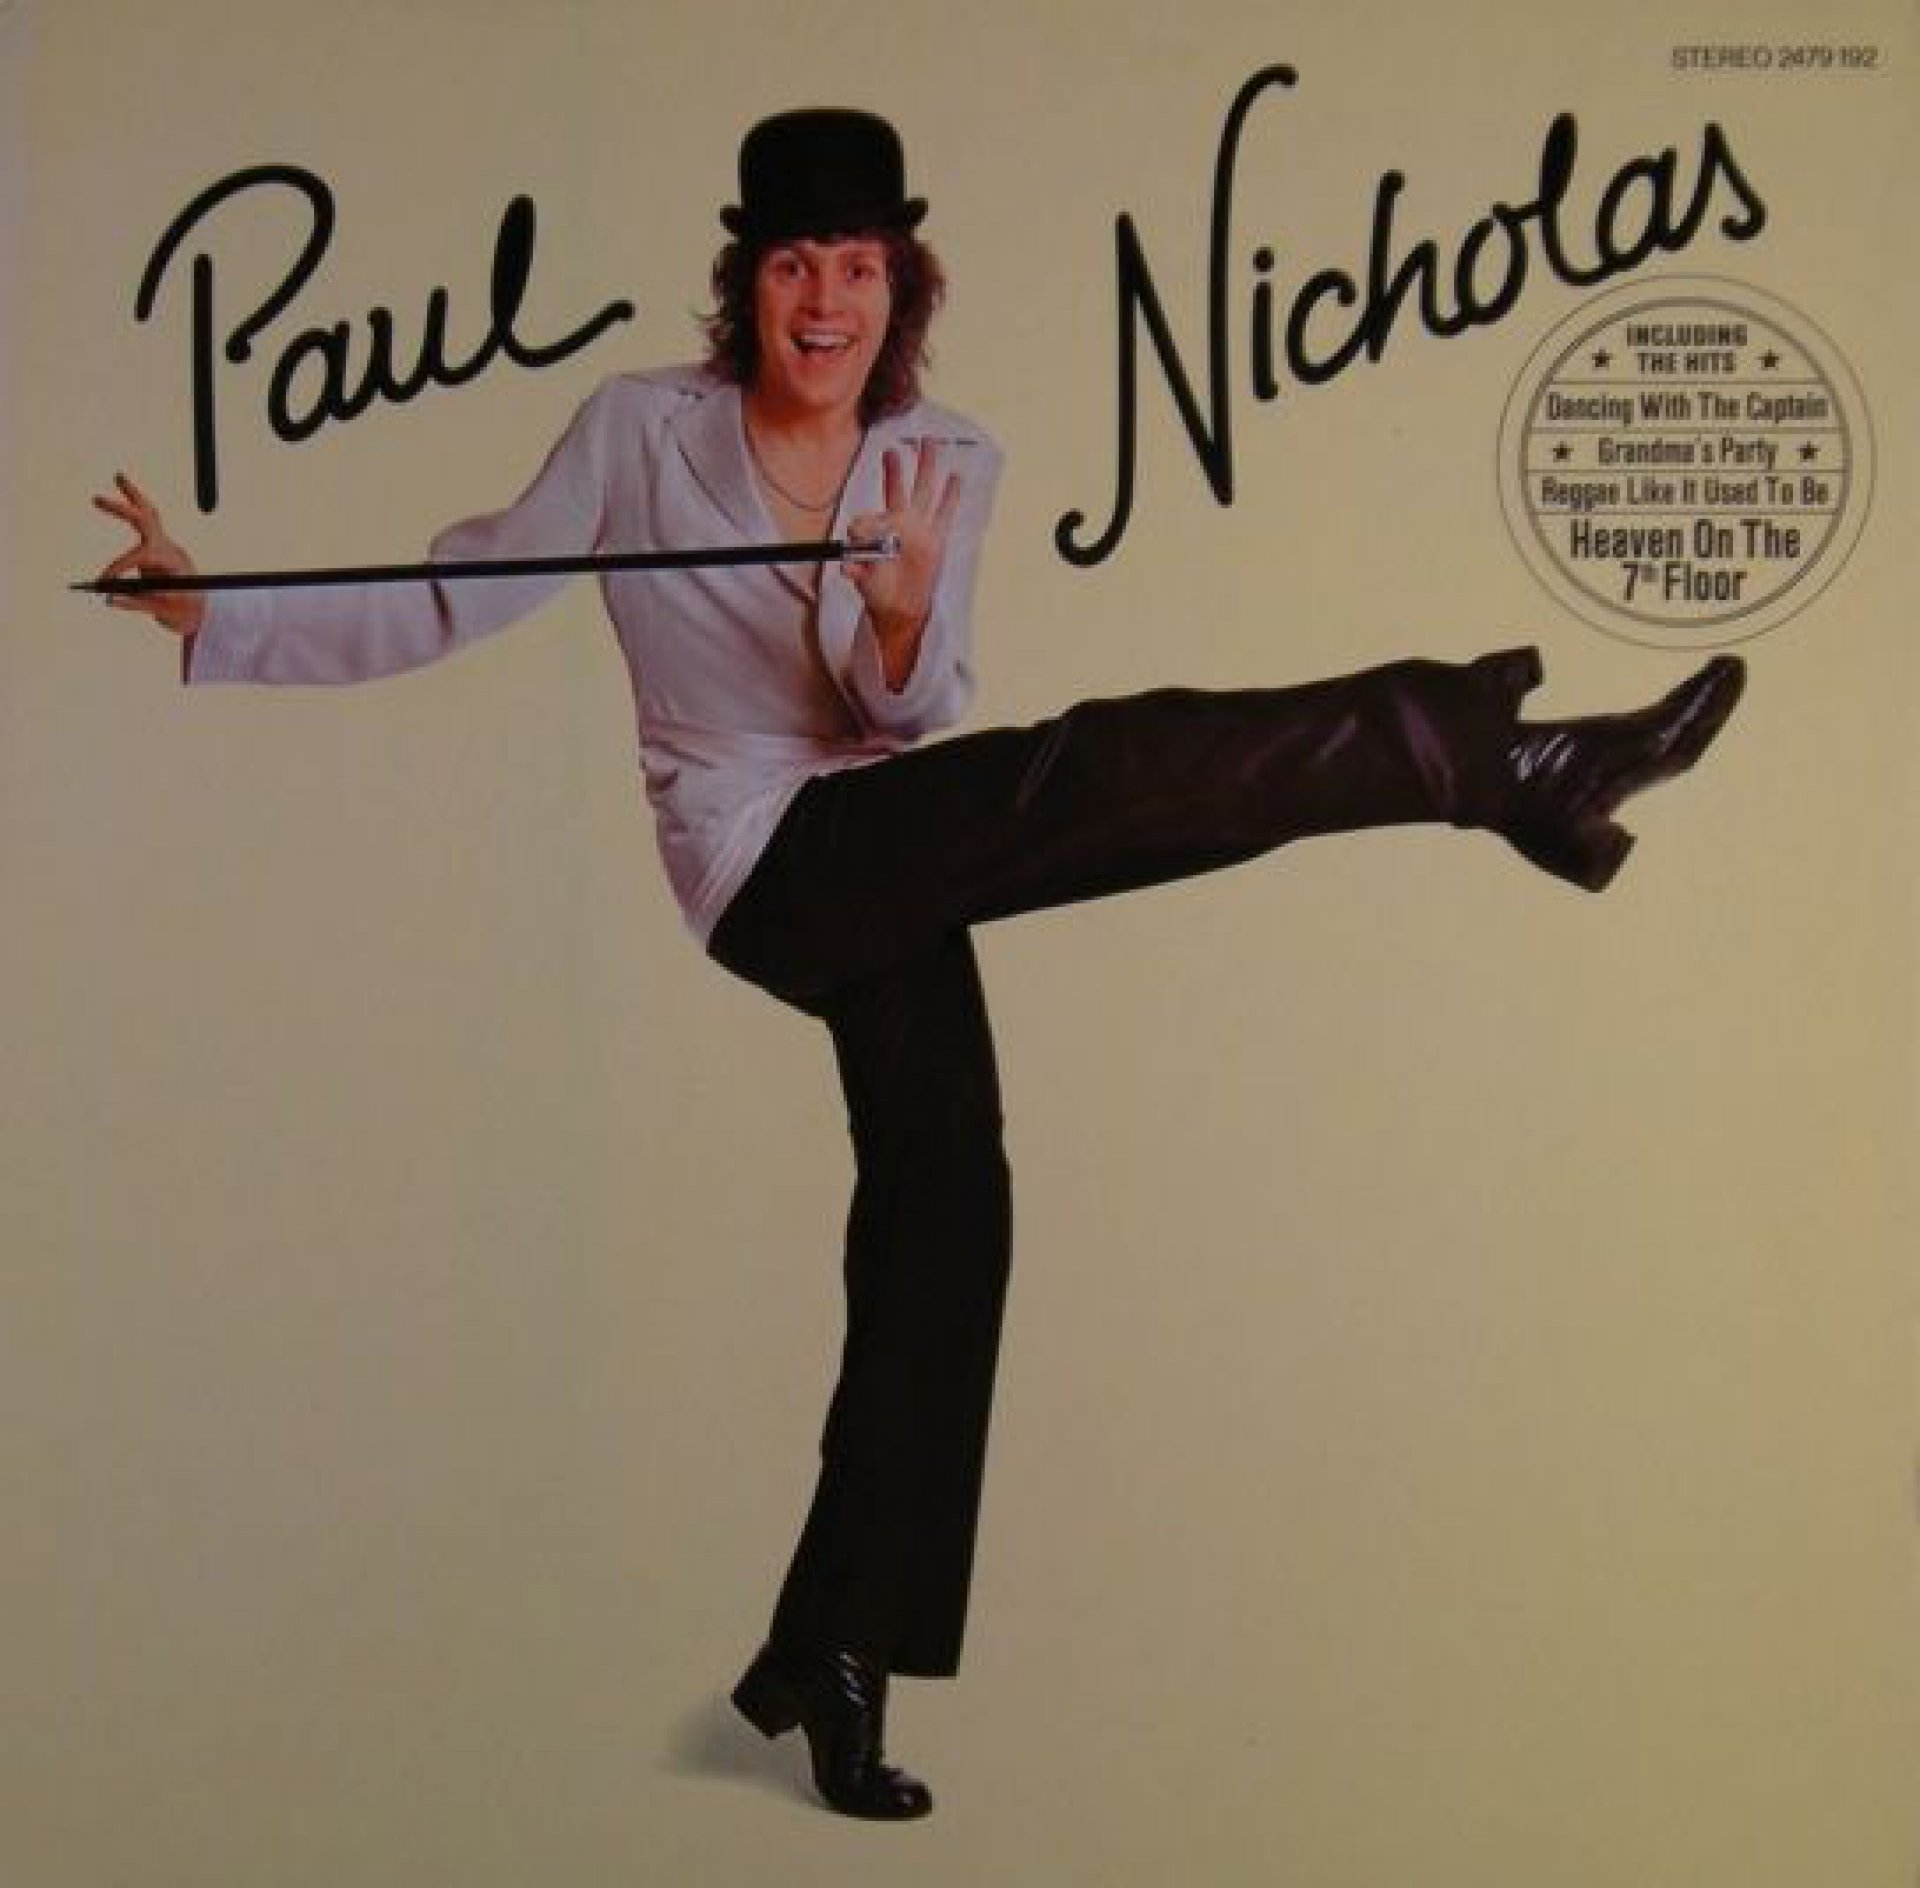 Paul Nicholas - Paul Nicholas